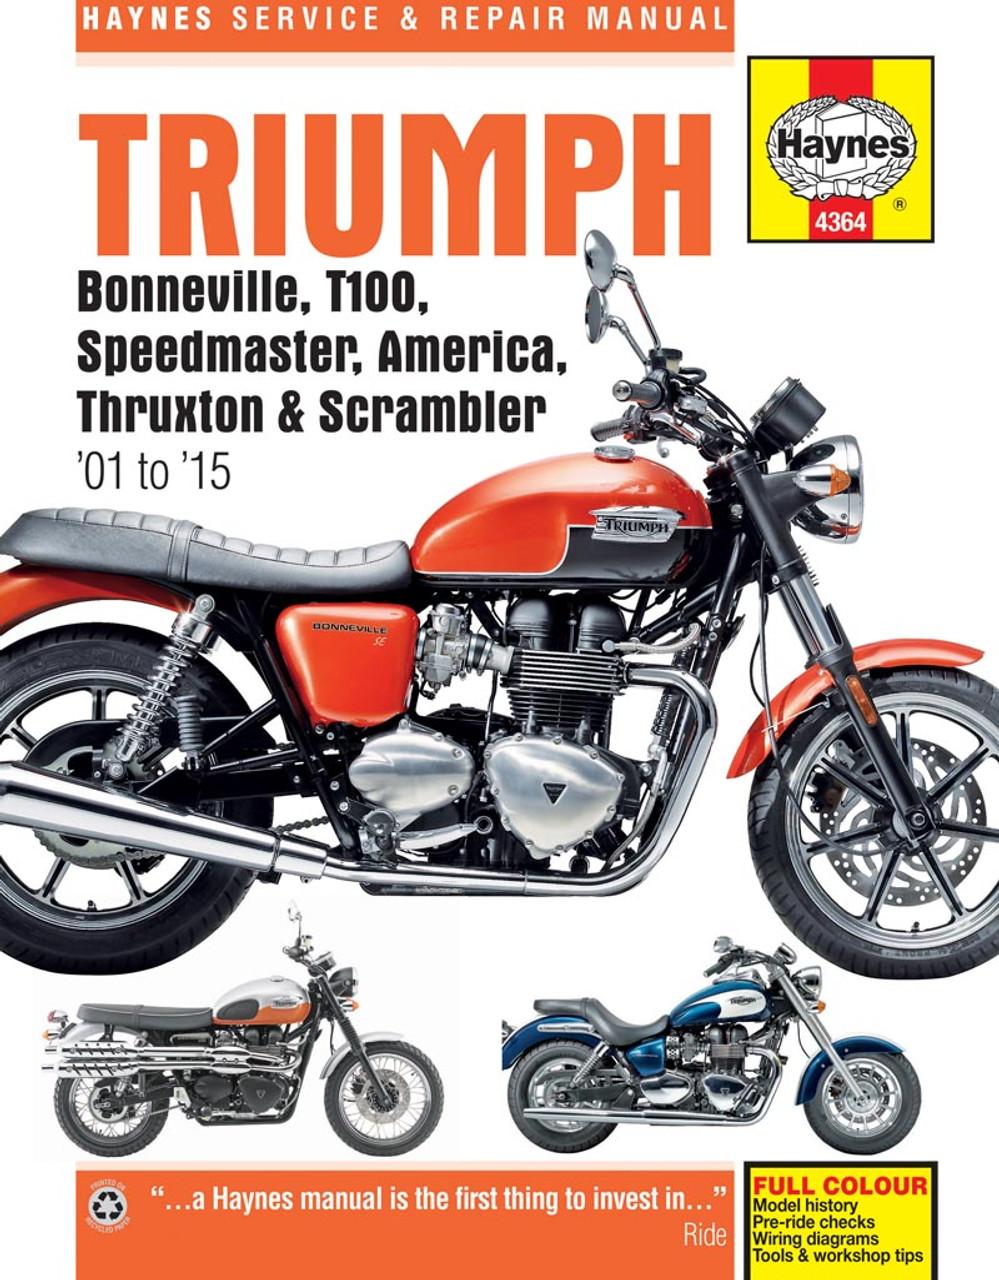 gujarat24news.com 2007 2008 2009 2010 2011 Triumph America ...